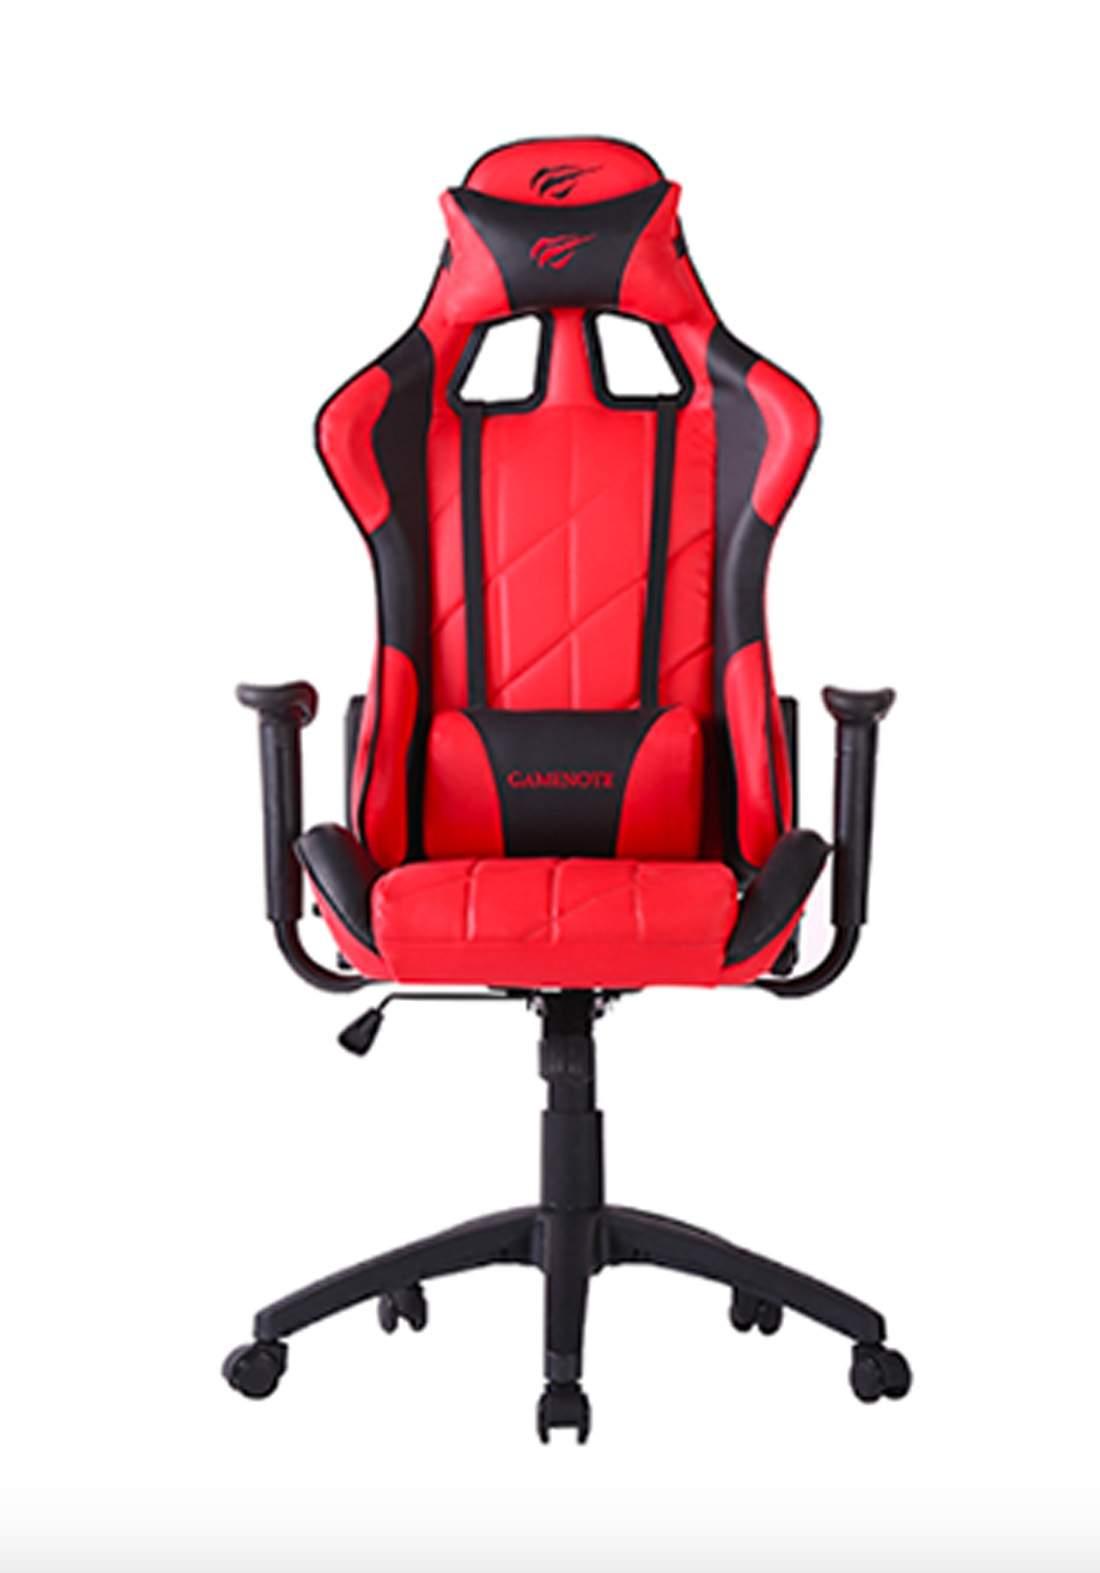 Havit Hv-Gc922 Gaming Chair - Red  كرسي ألعاب